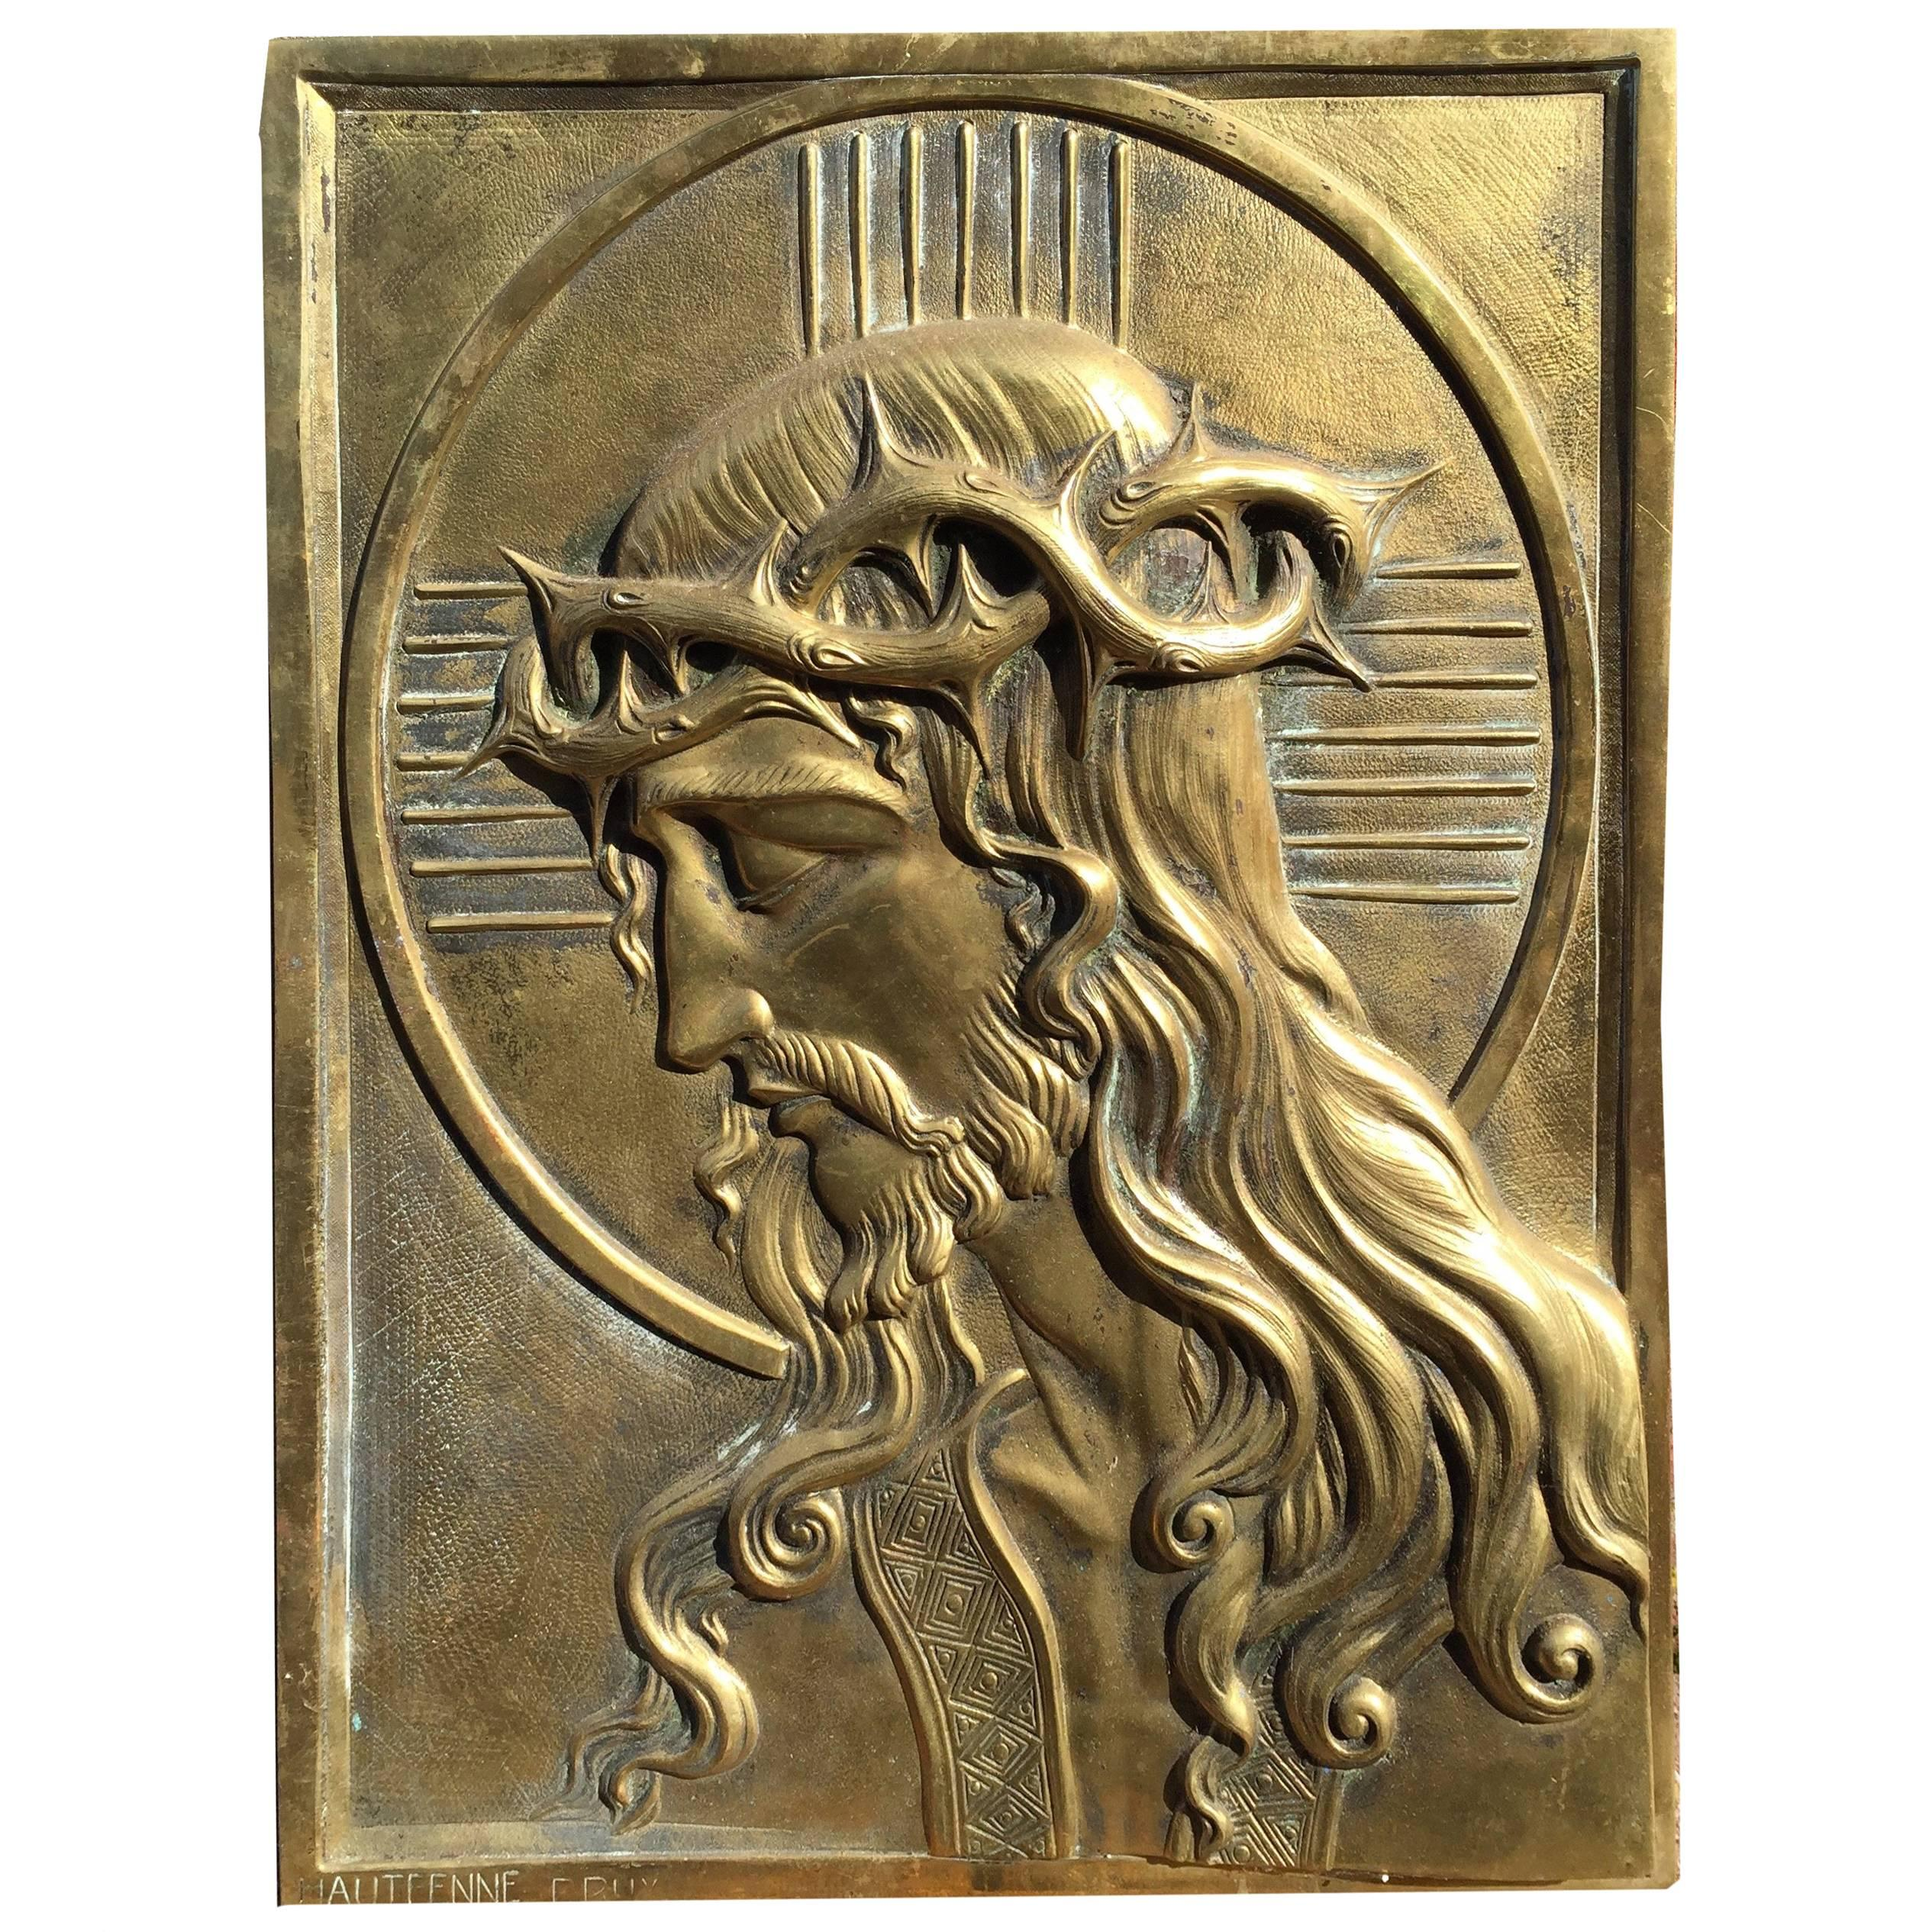 Early 1900 Heavy Art Nouveau Bronze Wall Plaque of Jesus - Christ by Hautfenne